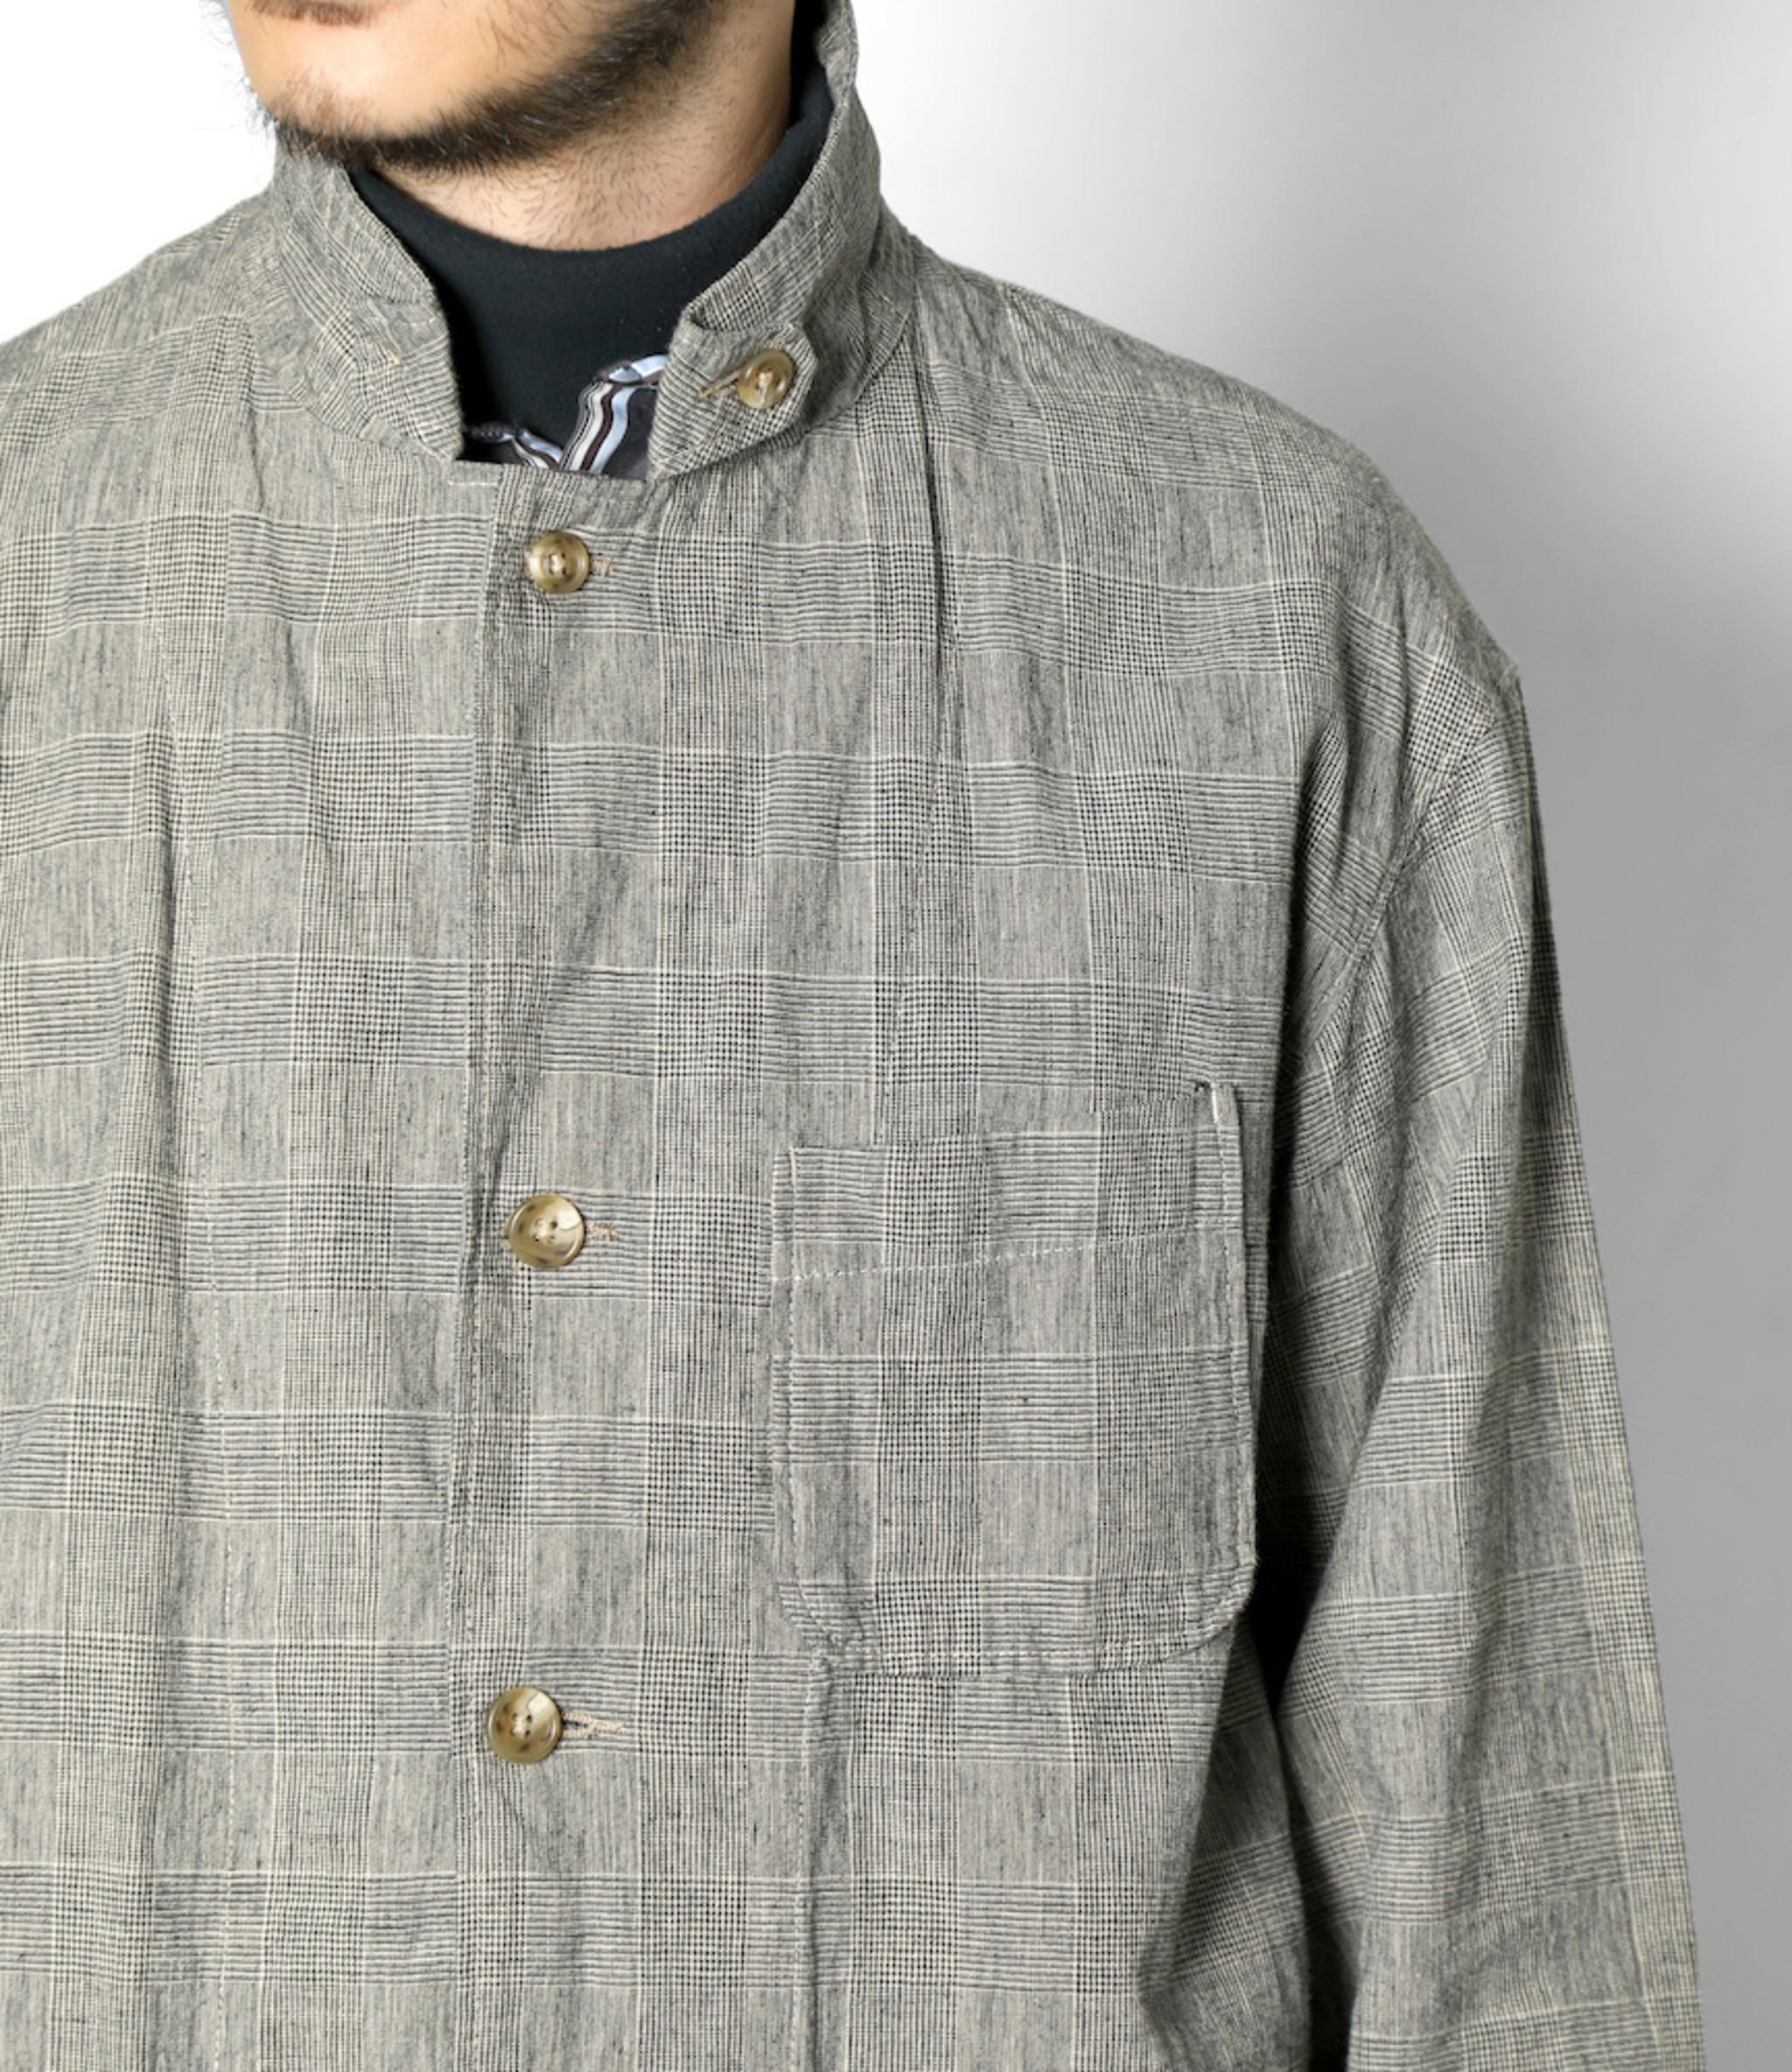 Engineered Garments Loiter Jacket - Grey CL Glen Plaid